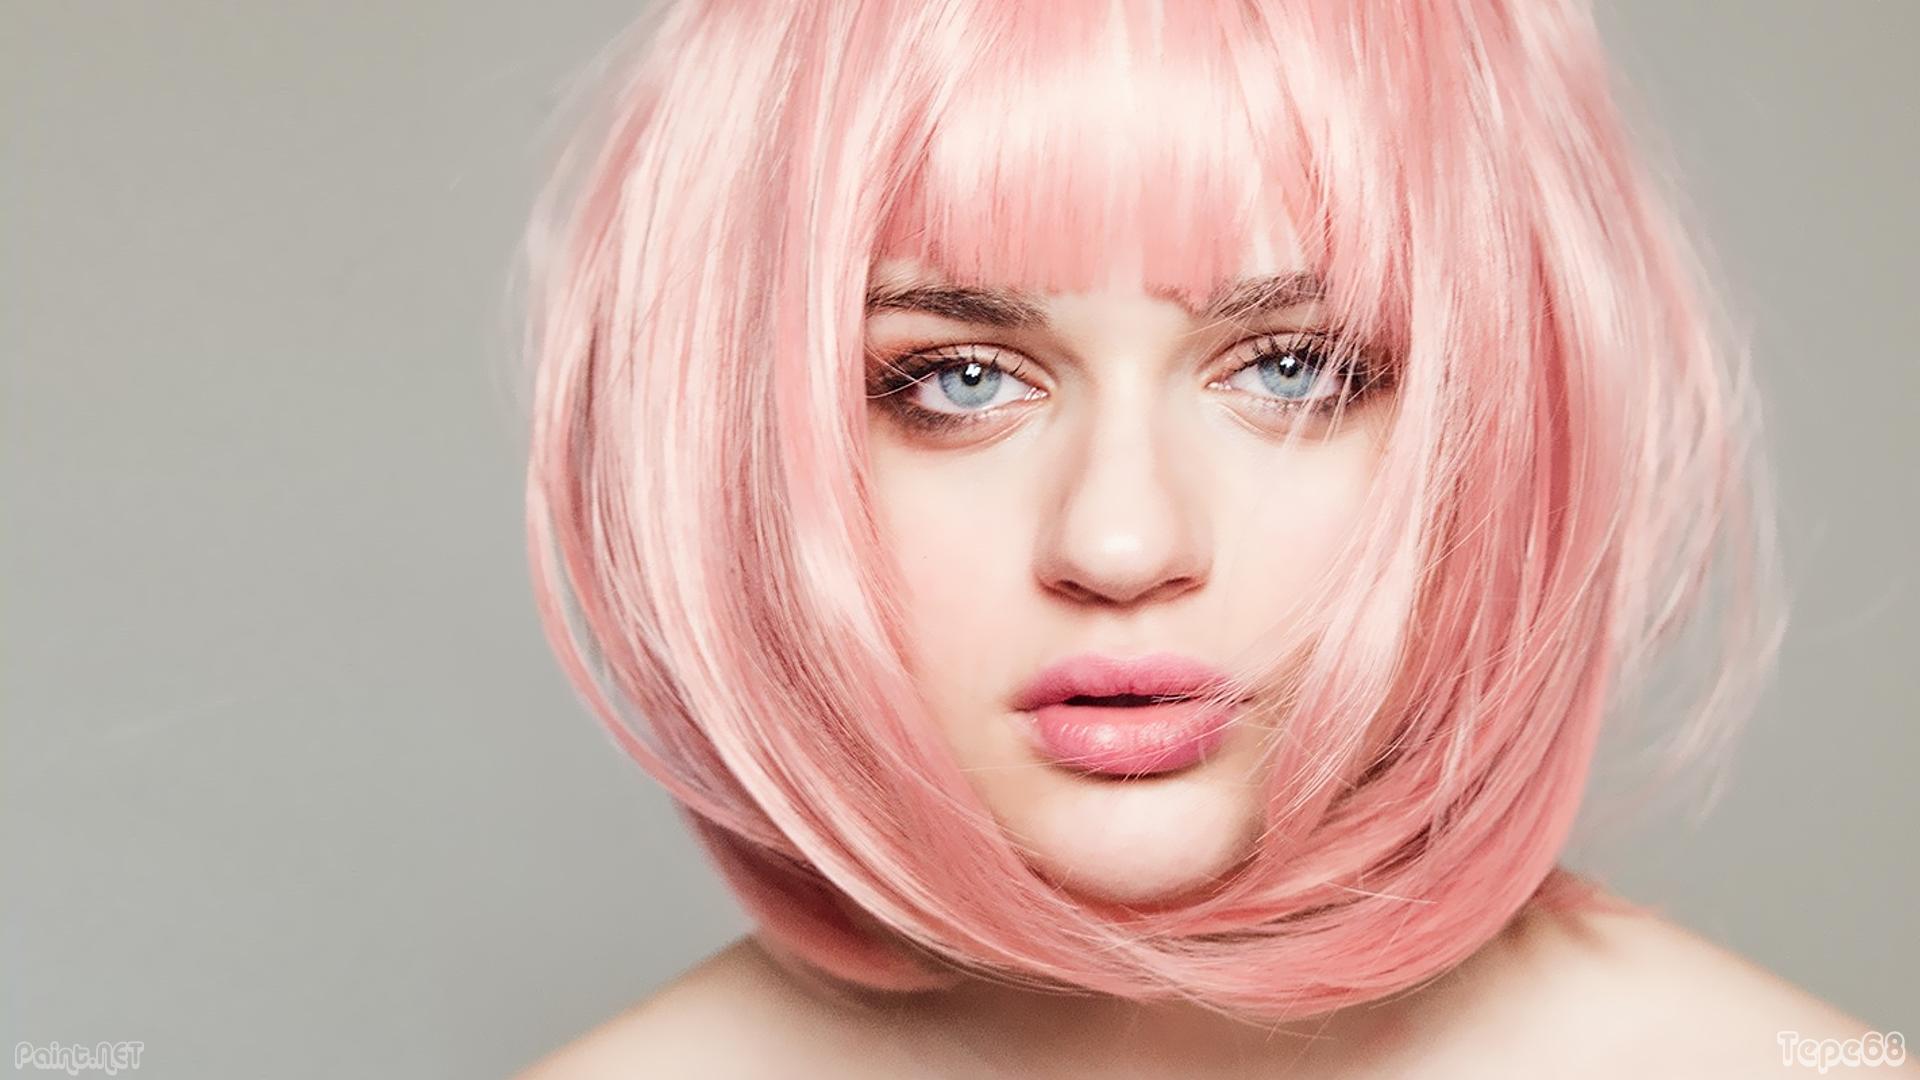 joey king pink hair hd wallpaper 2450